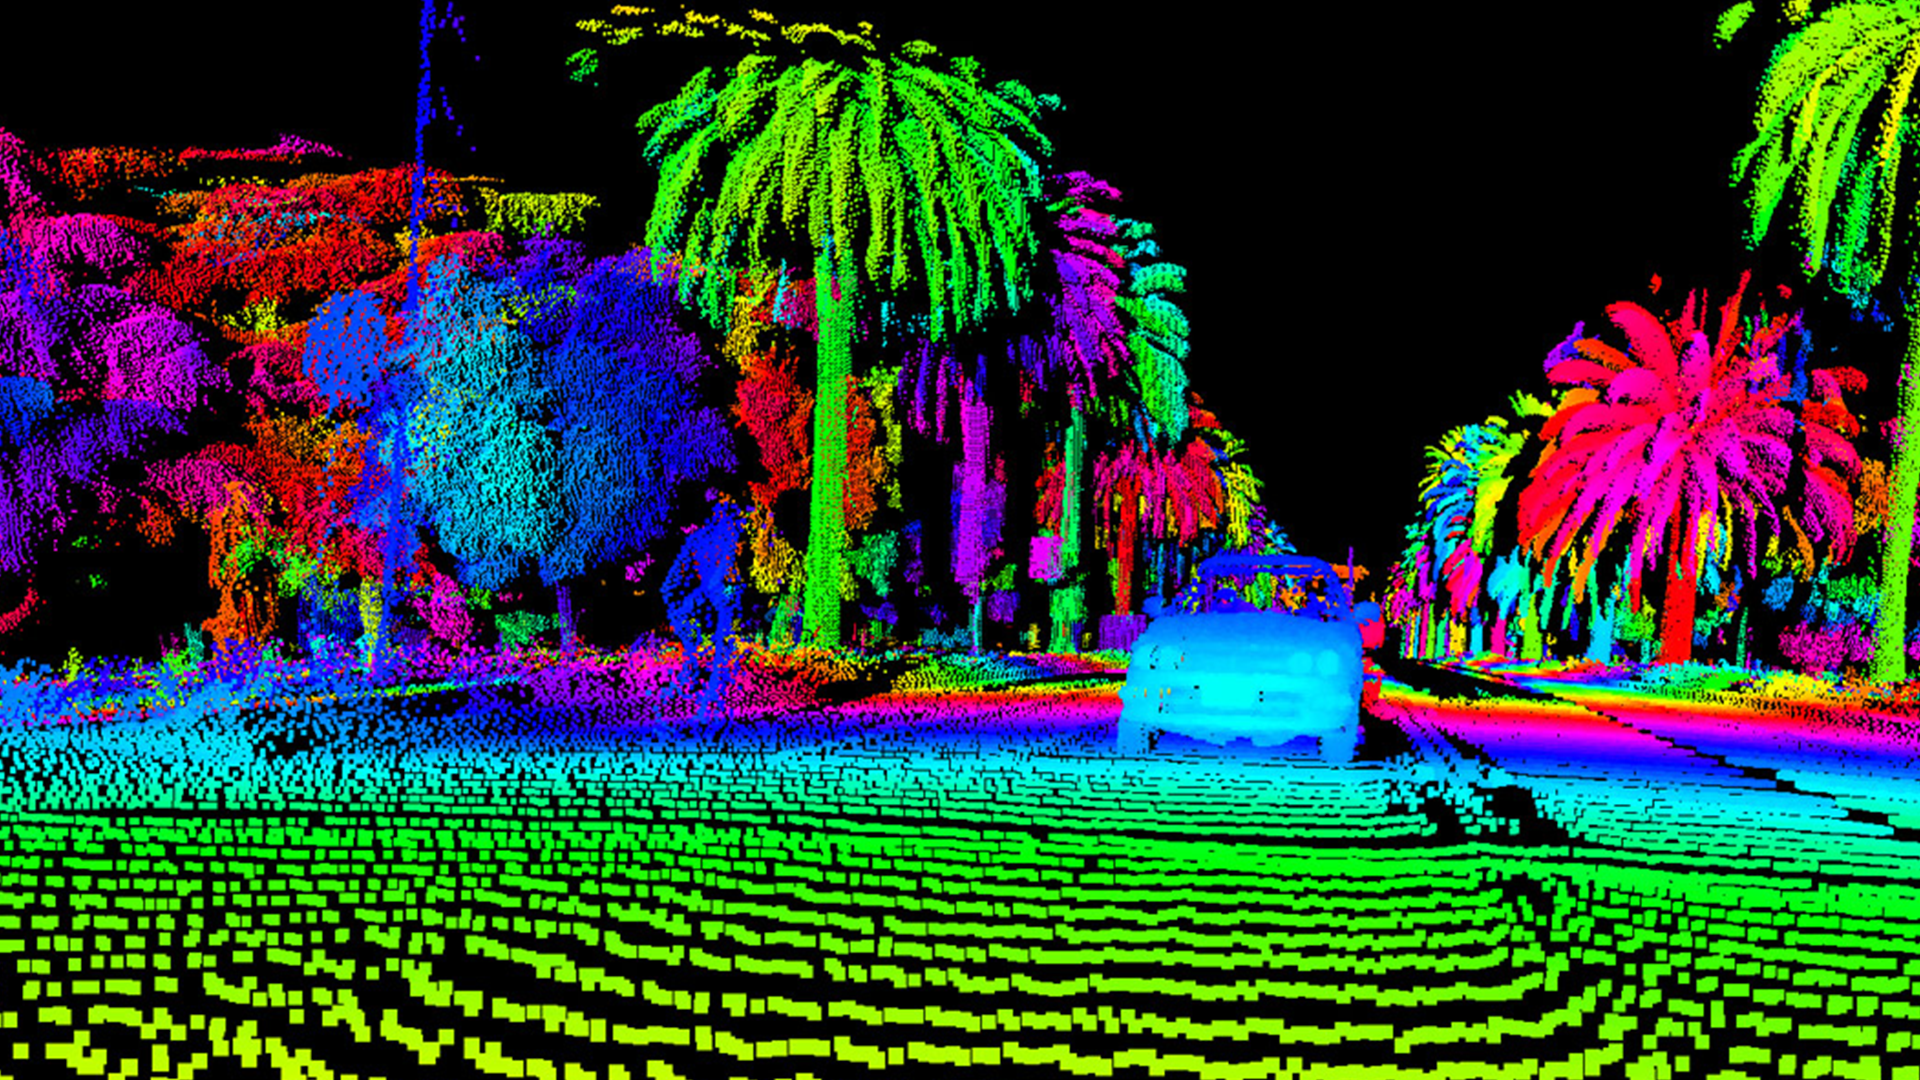 Toyota Research Institute's autonomous test vehicle, Platform 2.1 uses Luminar's sensing technology